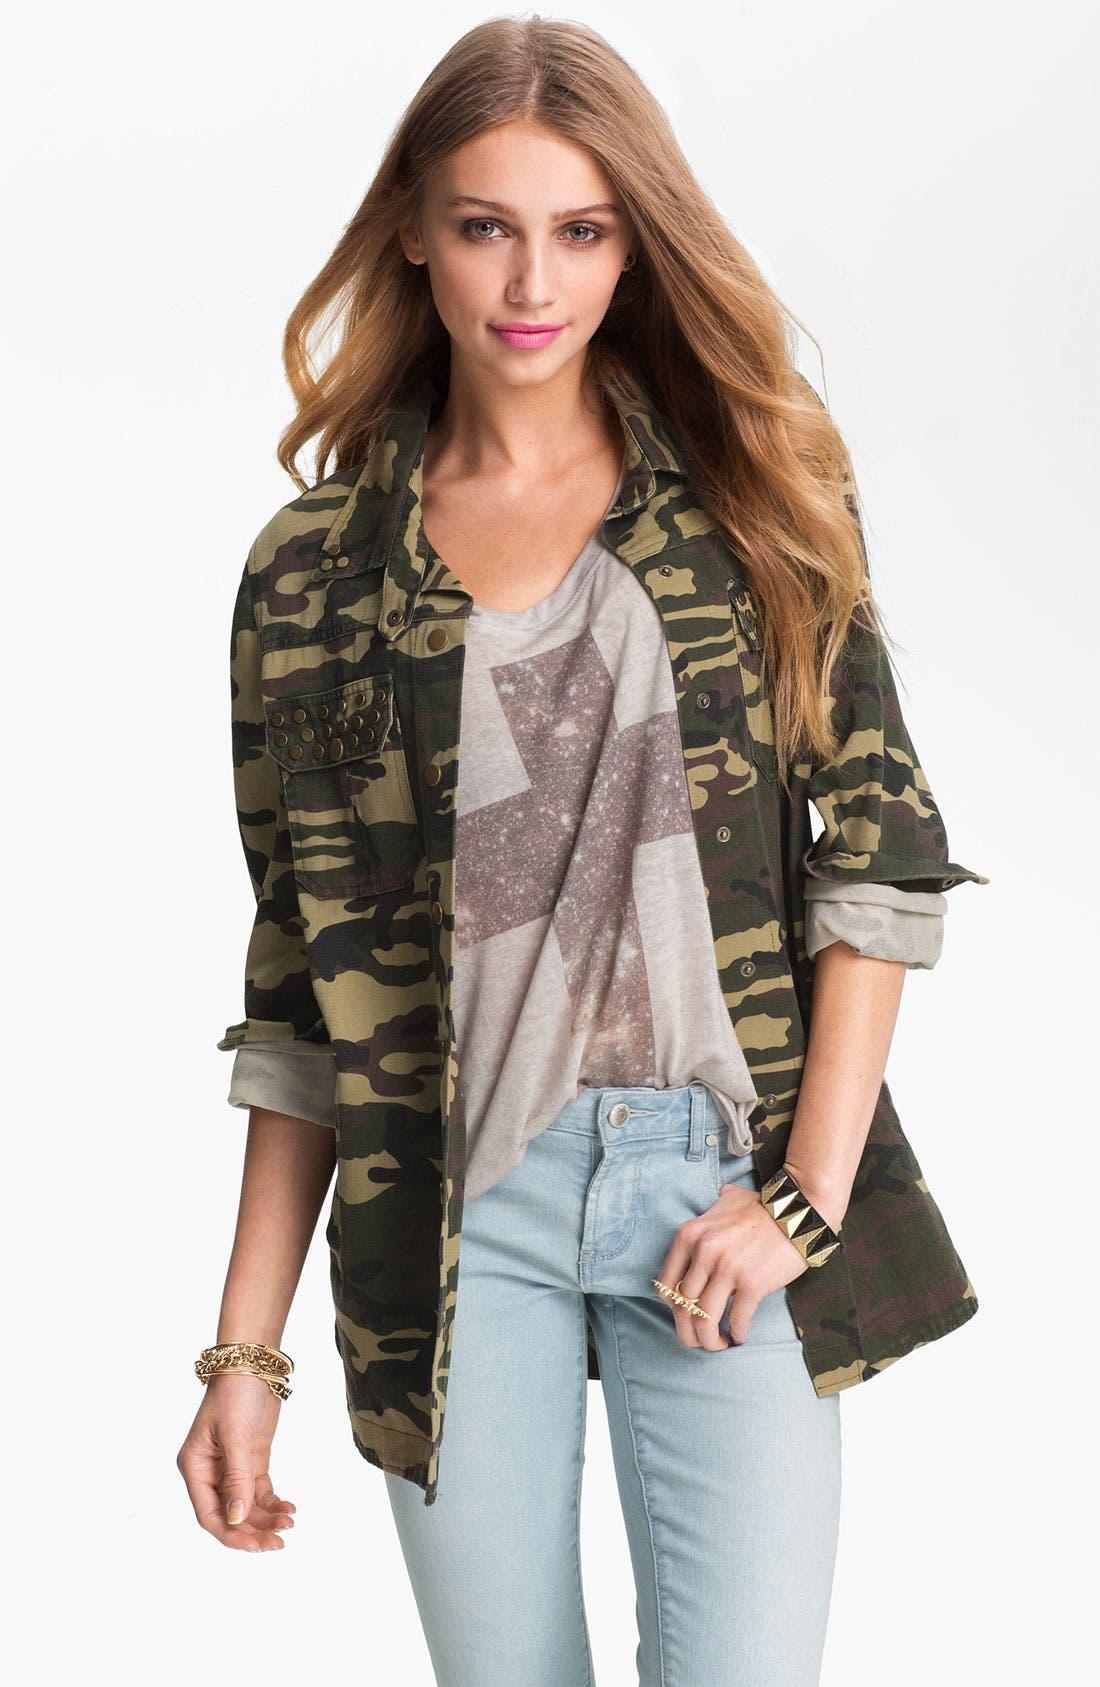 Alternate Image 1 Selected - Lush Studded Camo Print Army Jacket (Juniors)